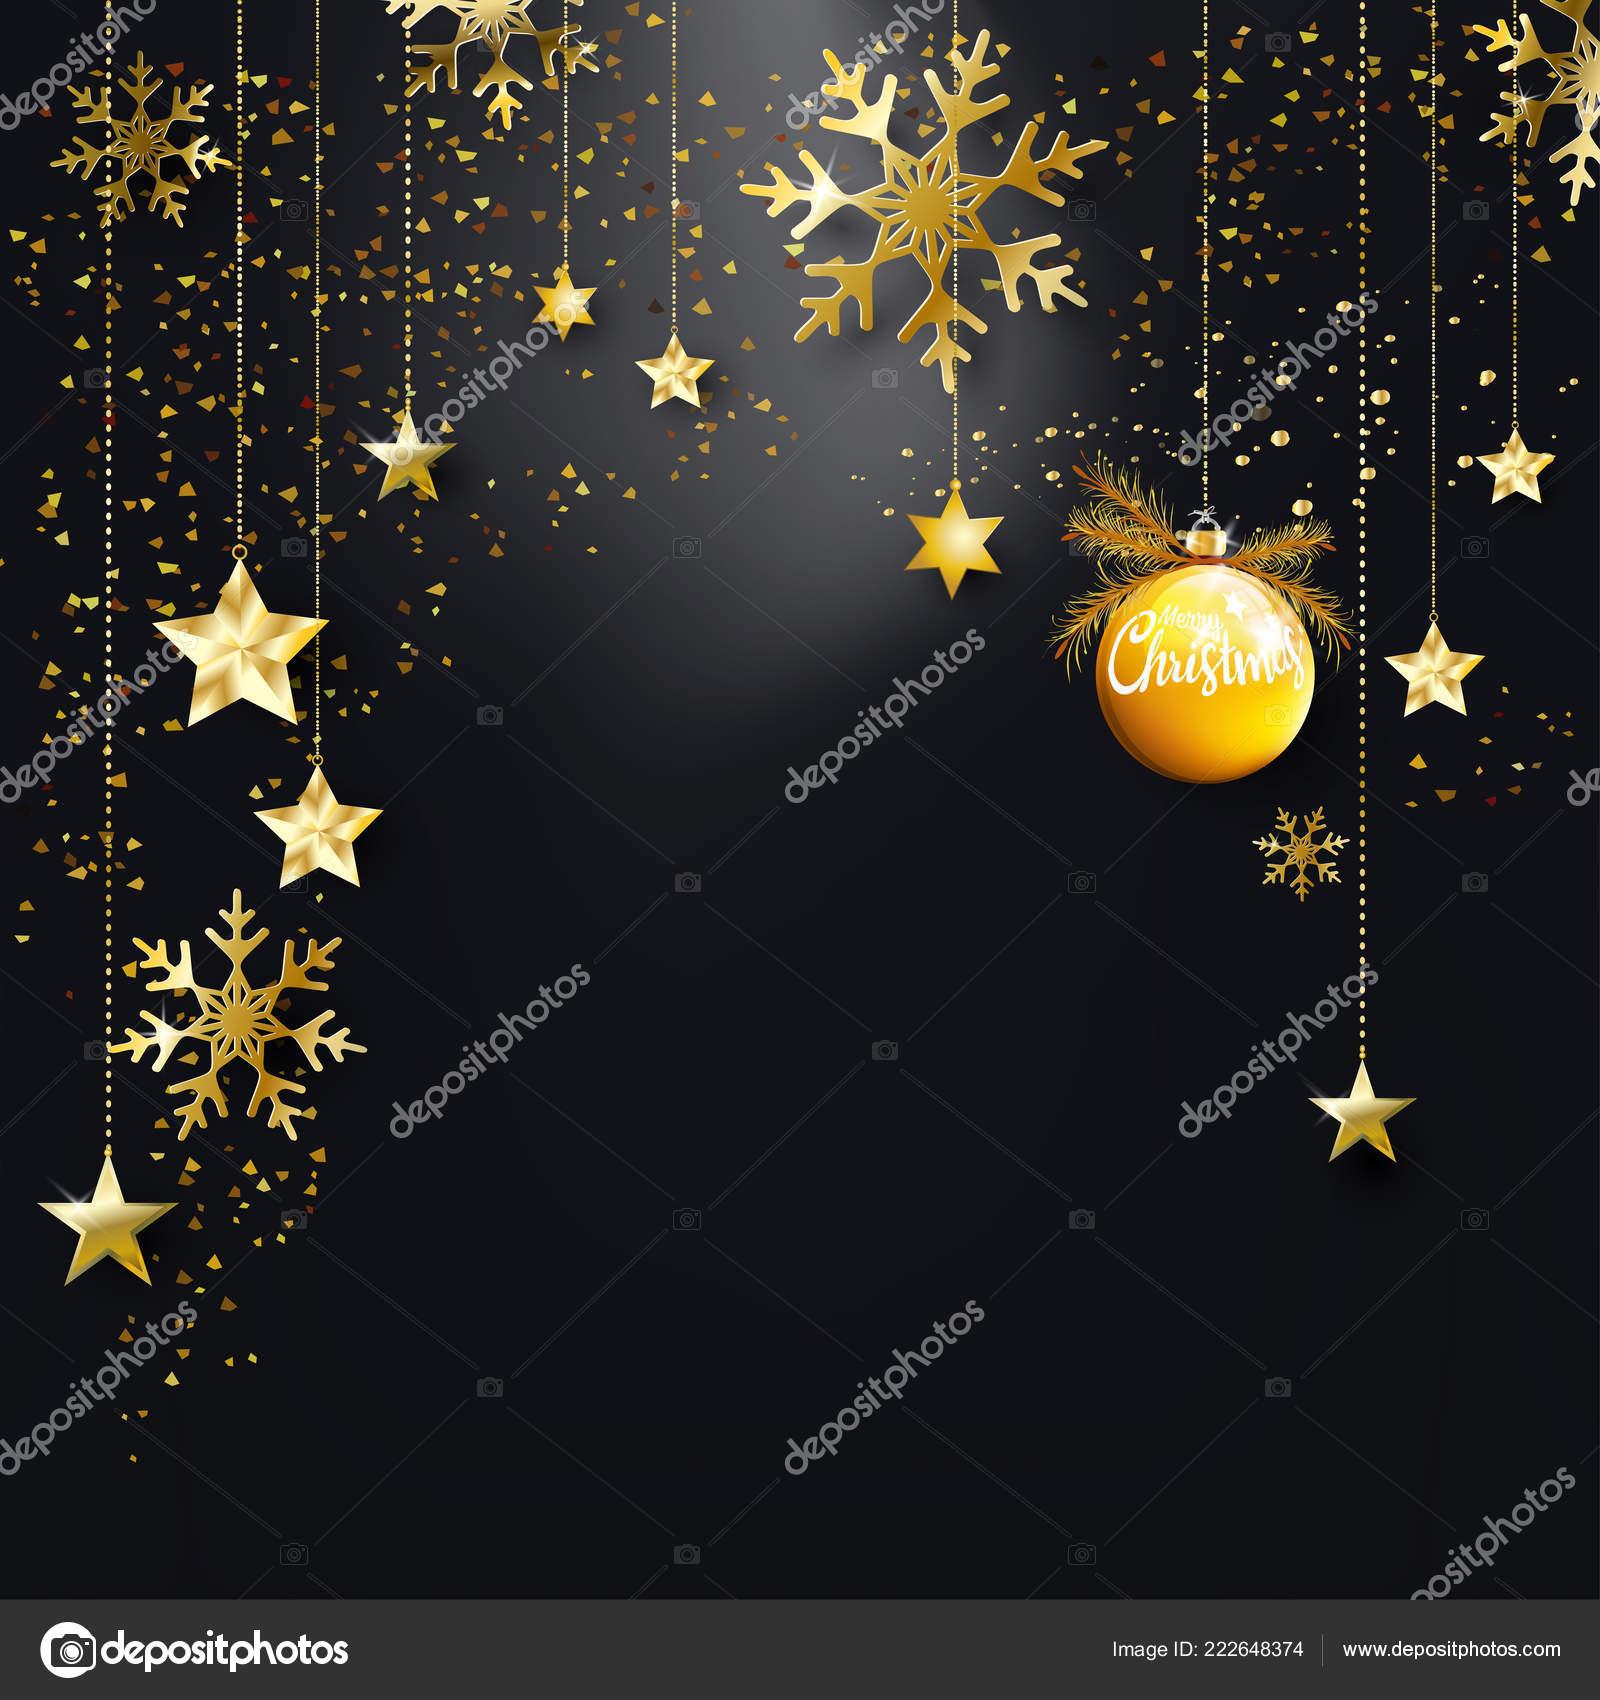 Christmas Invitation Background Gold.Background Gold Black Christmas Black Christmas